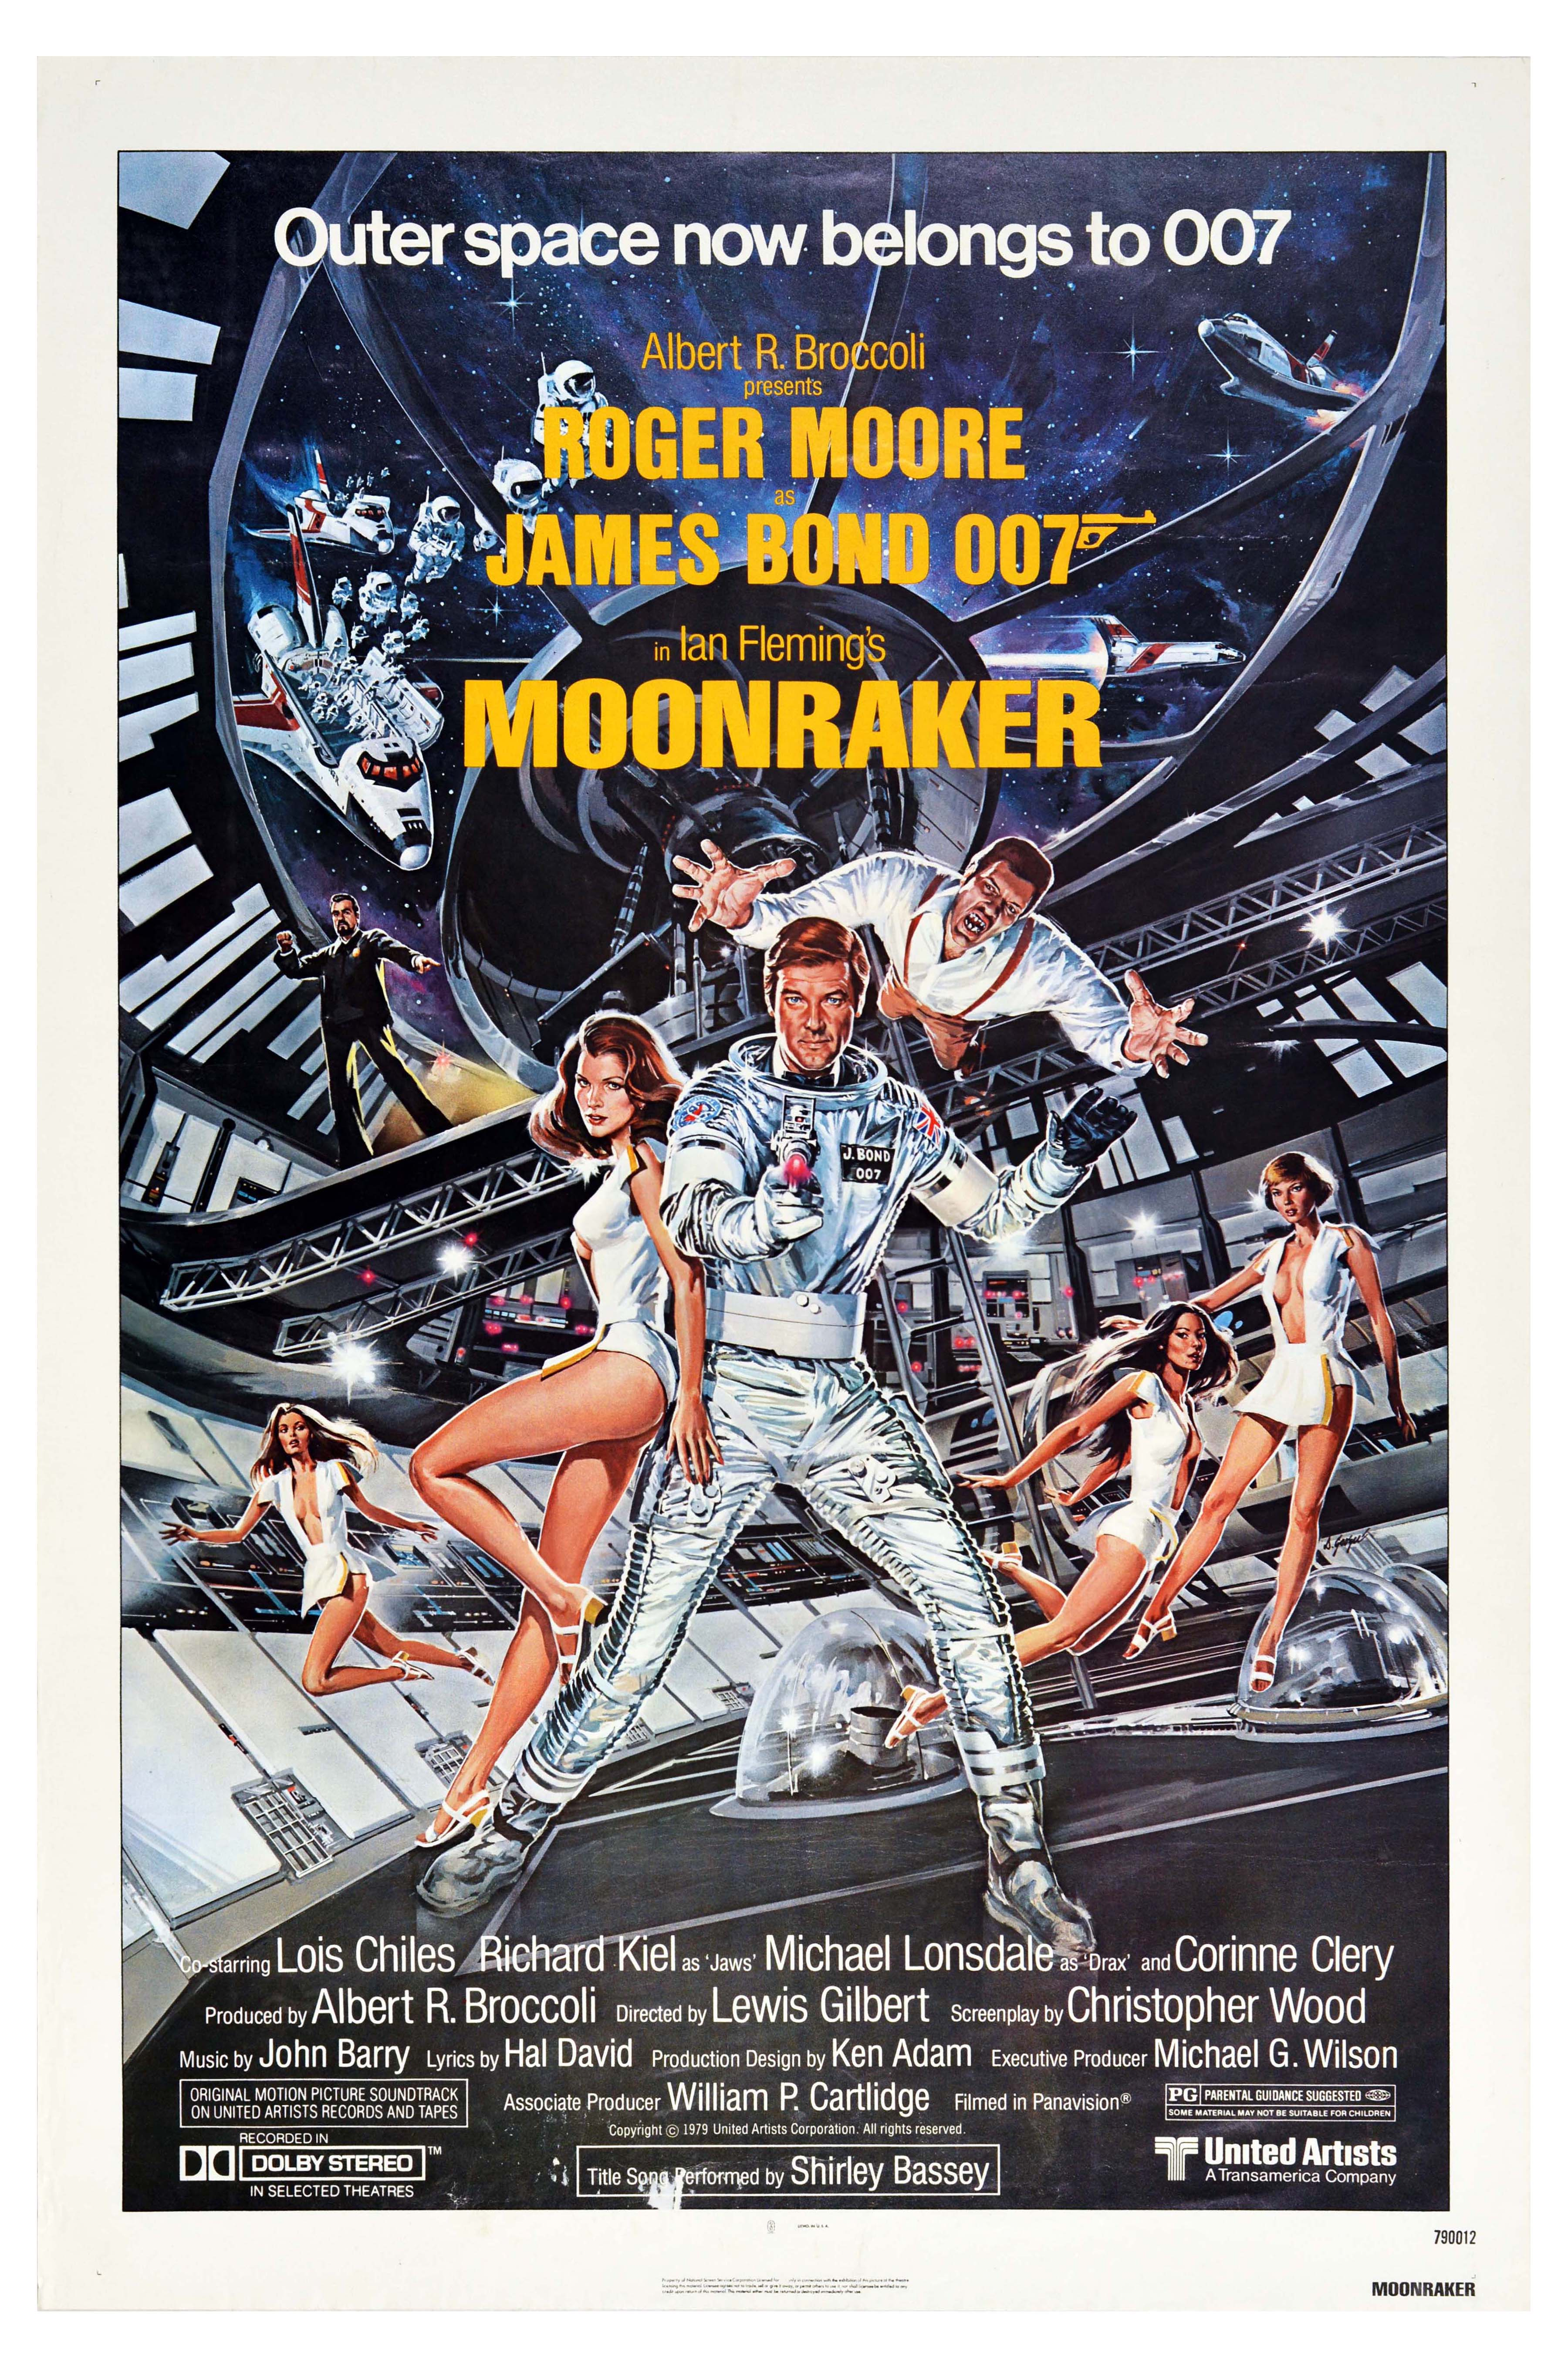 Movie Poster James Bond 007 Moonraker USA One Sheet